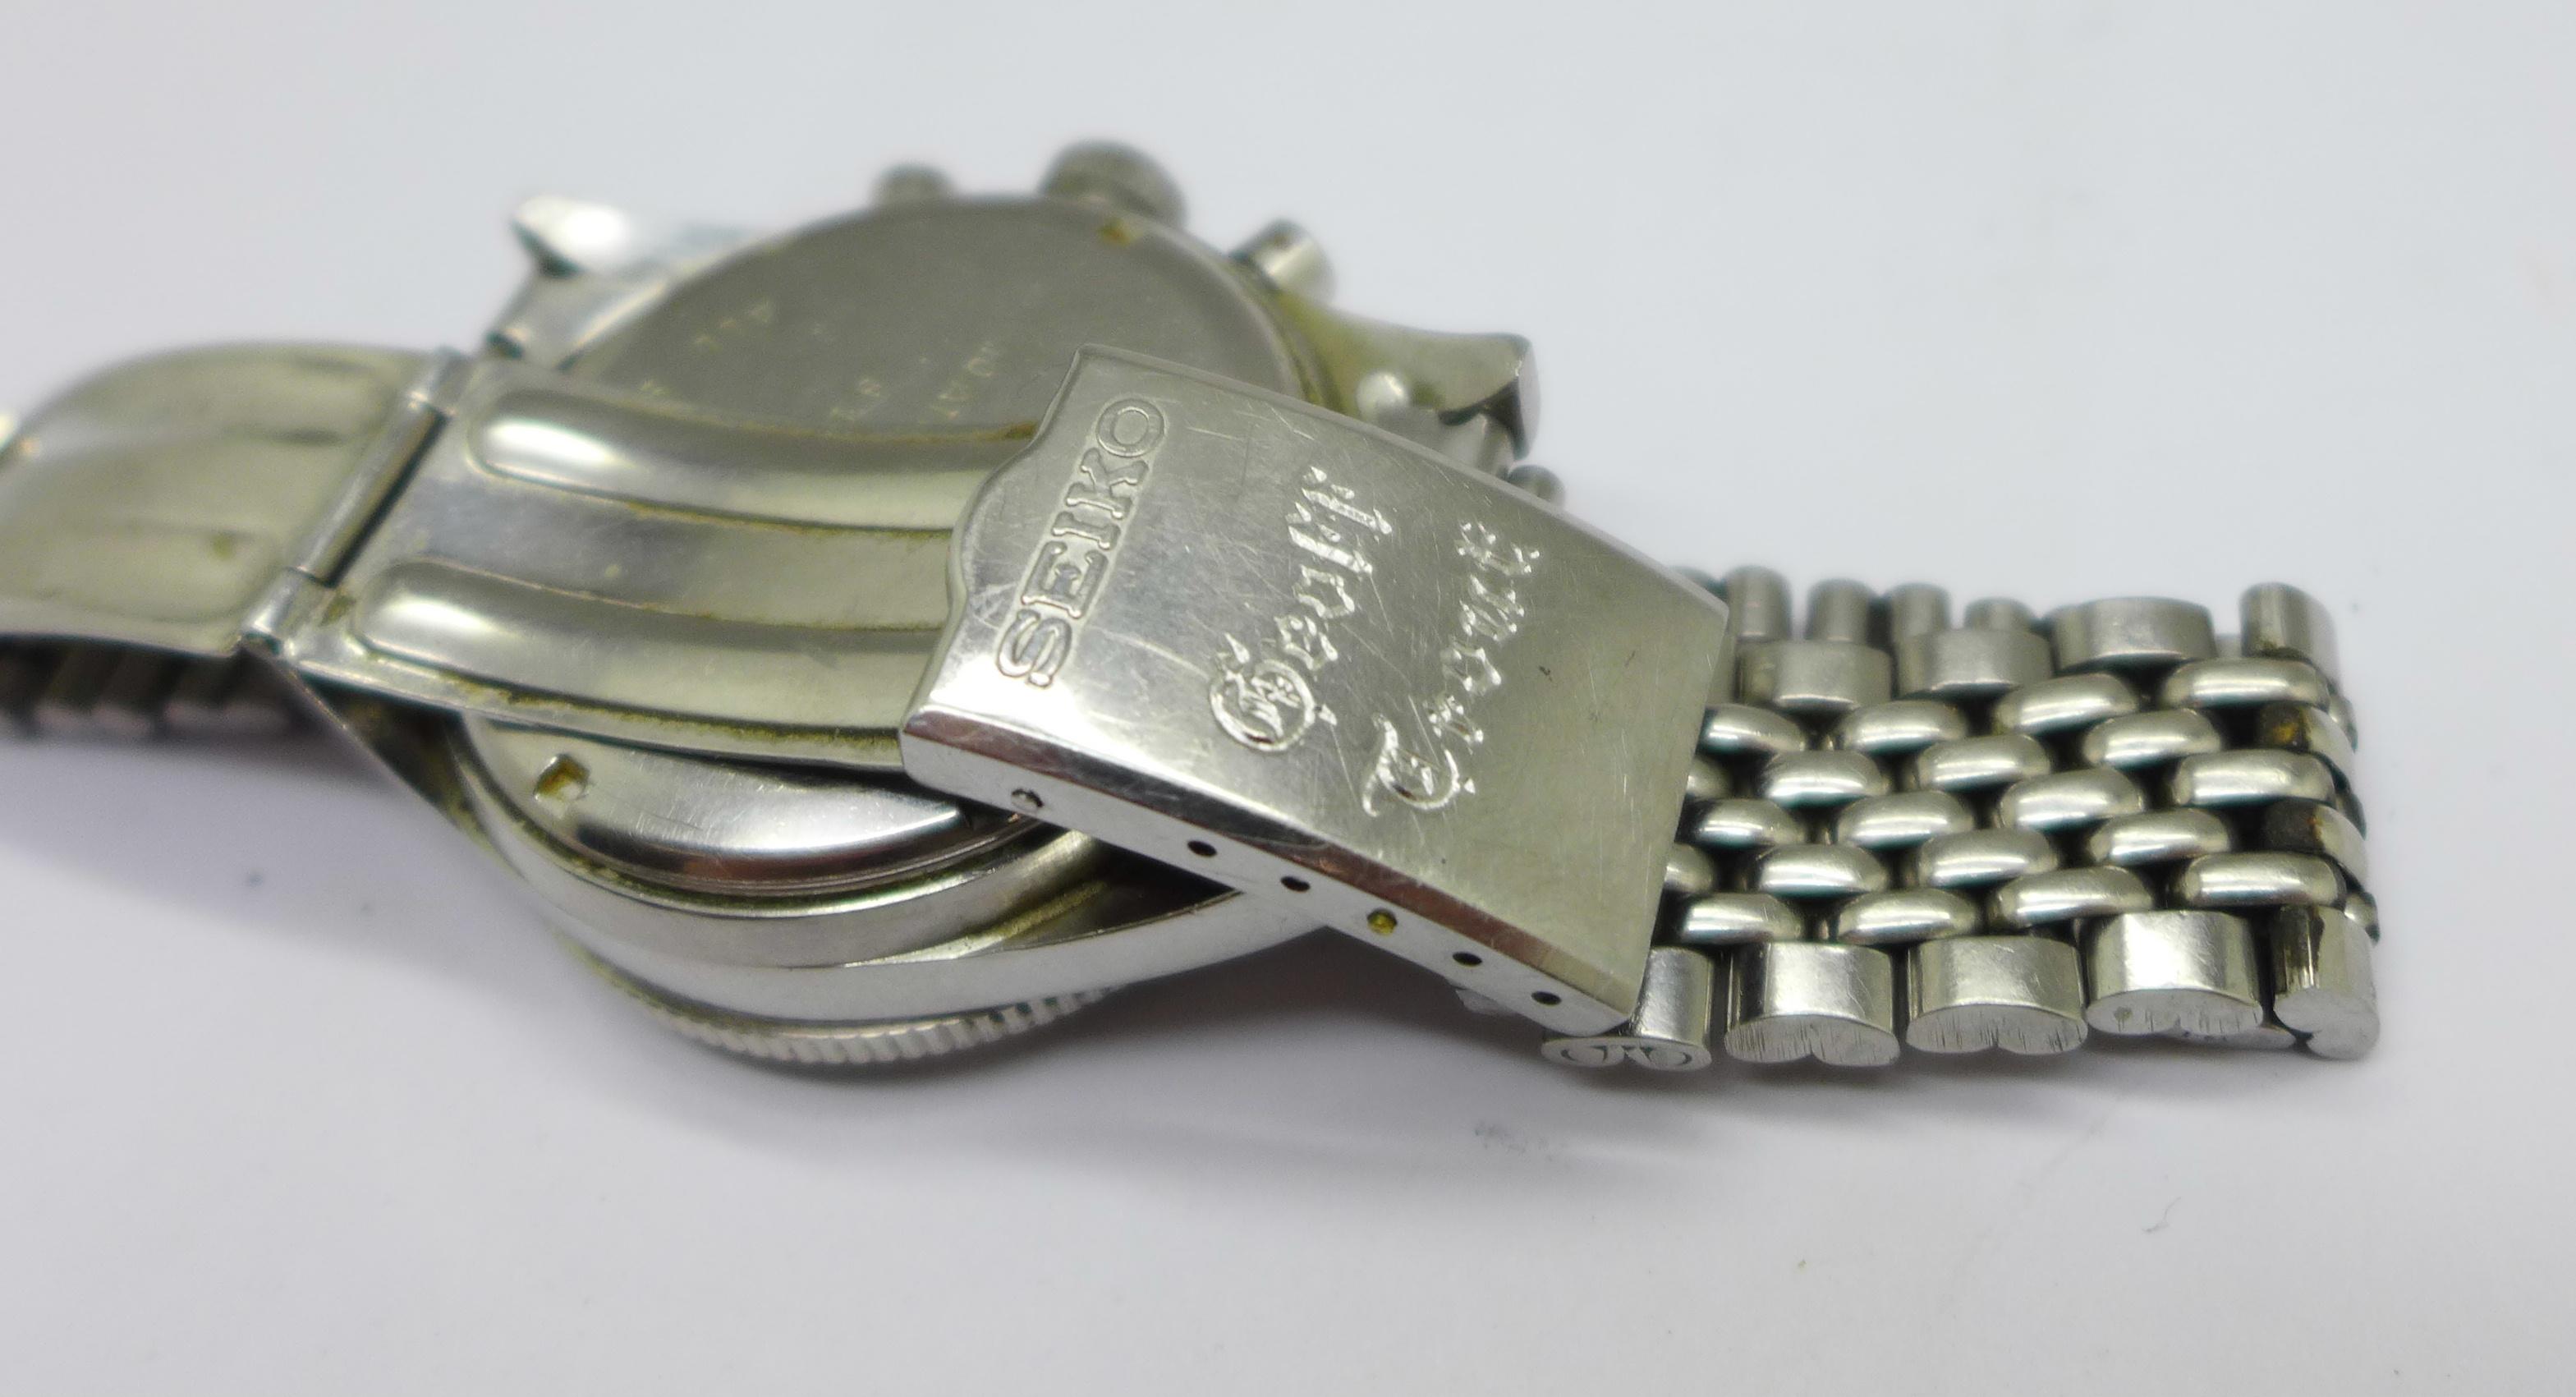 A Yema Yachtingraf 17 jewels chronograph wristwatch on a Seiko bracelet strap, chronograph buttons - Image 6 of 8